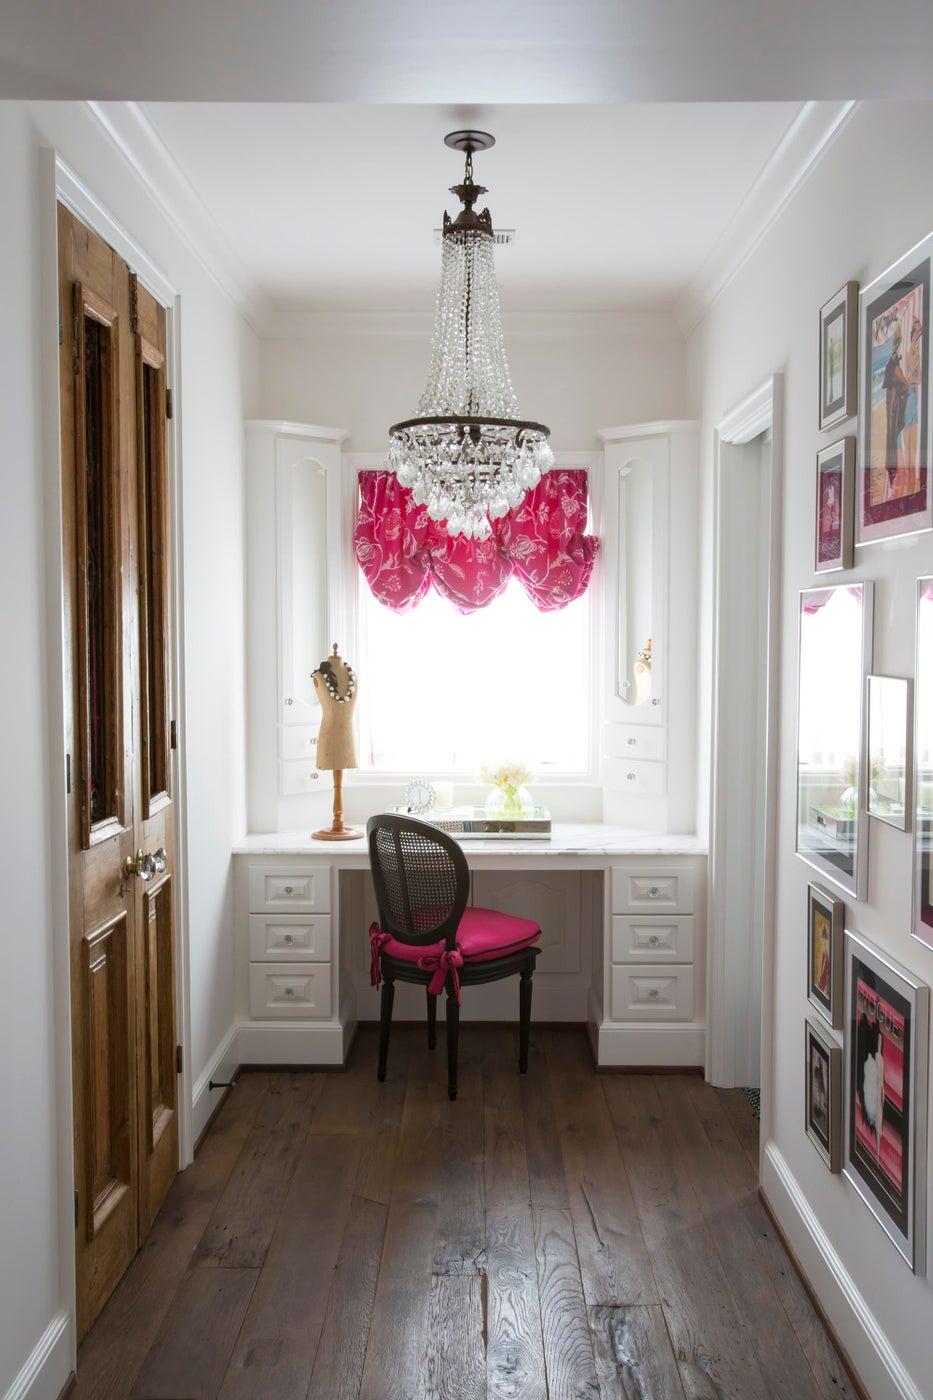 Girls vanity area inspired by Parisian fashion- reclaimed doors & bright fabrics